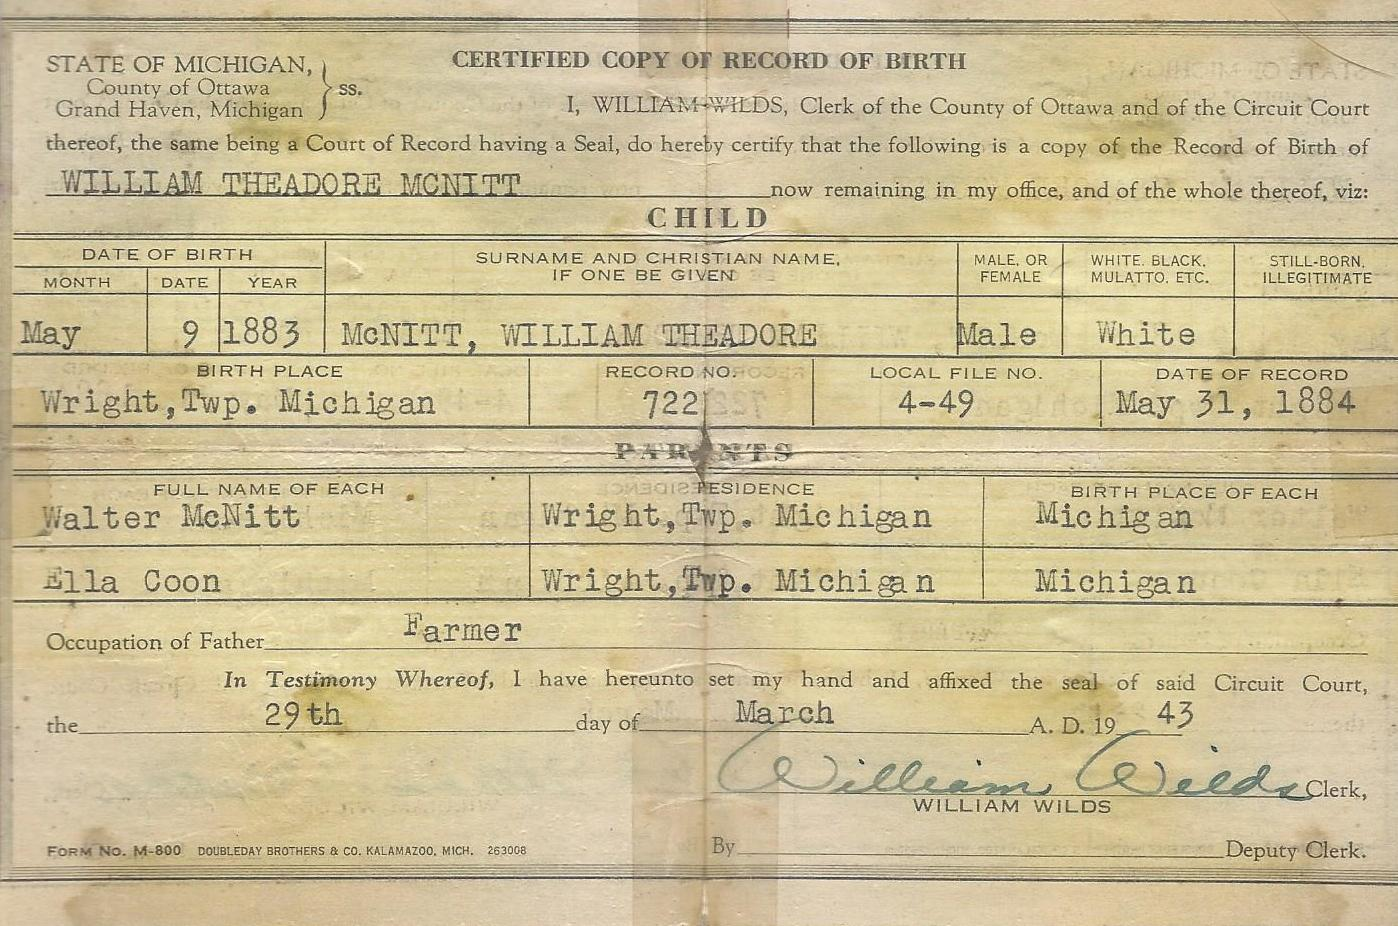 Agencies in the State of Michigan (MI) who provide Birth Certificates